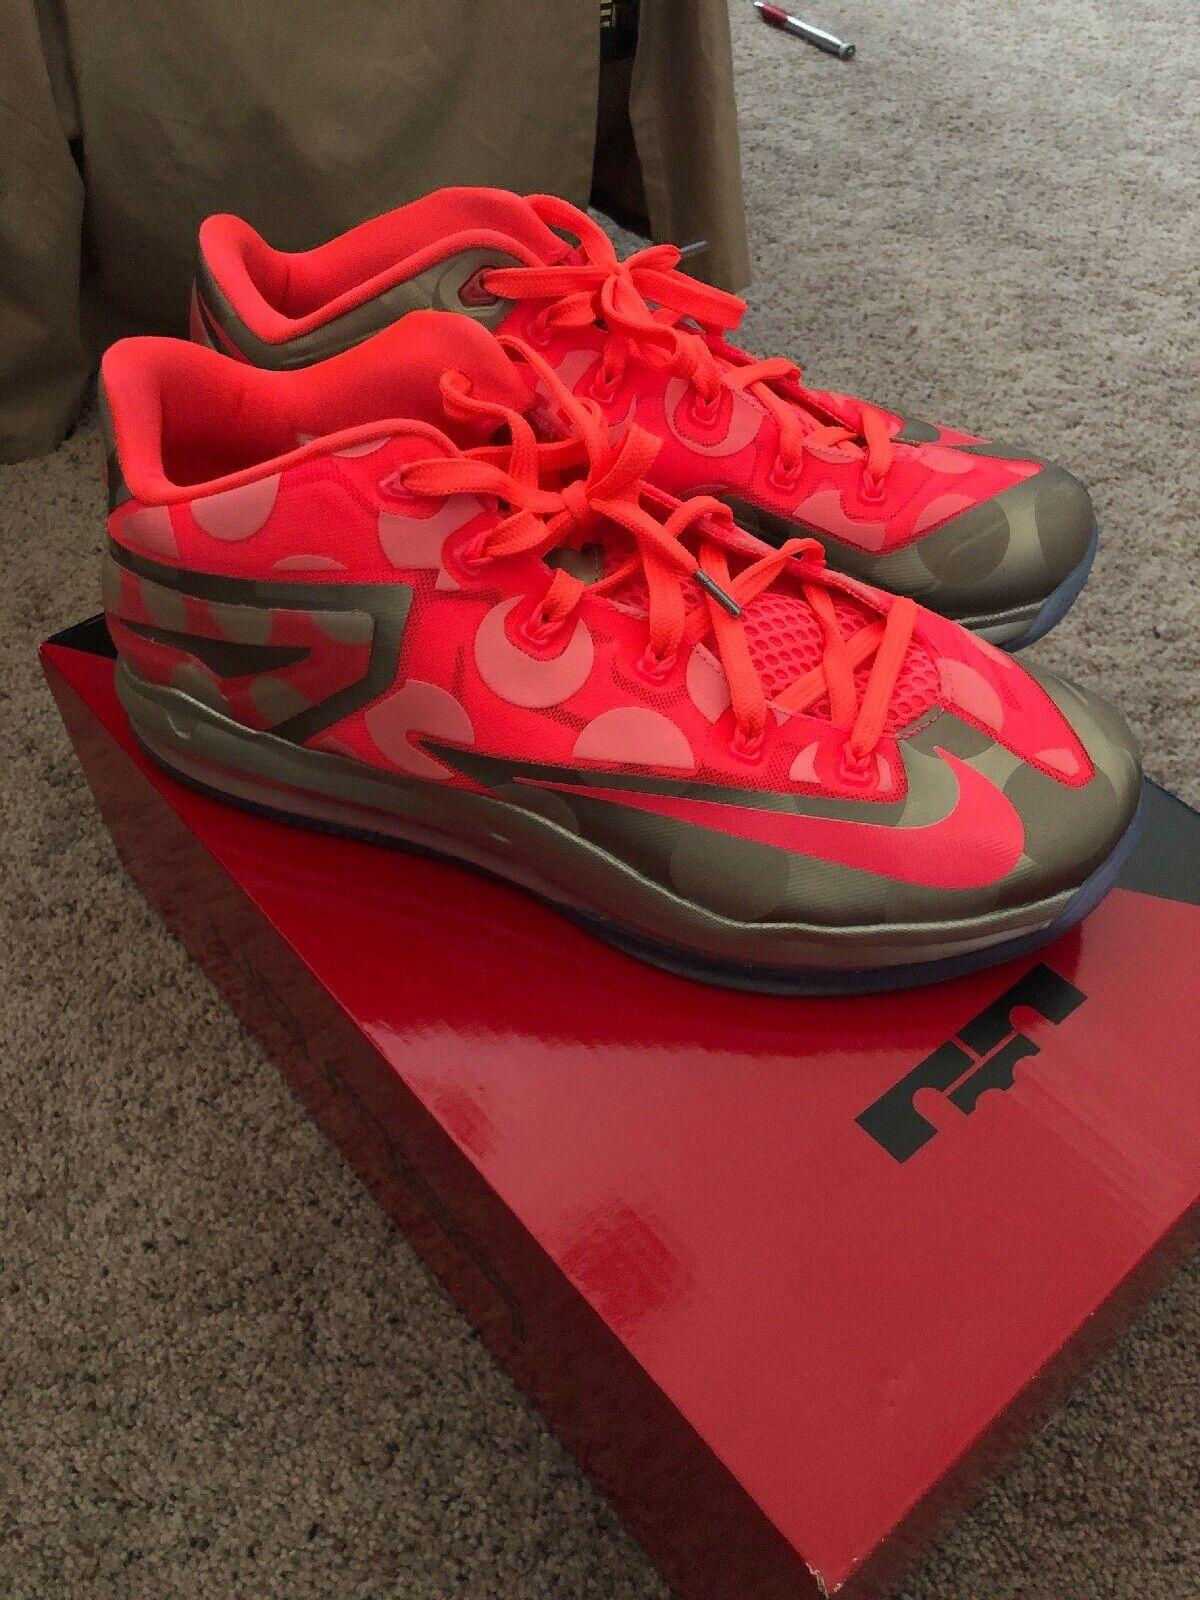 Nike Max Lebron XI  11 Low Maison Du Collection 683256 -064 Sz 10 Hyper Punch XVI  80% di sconto